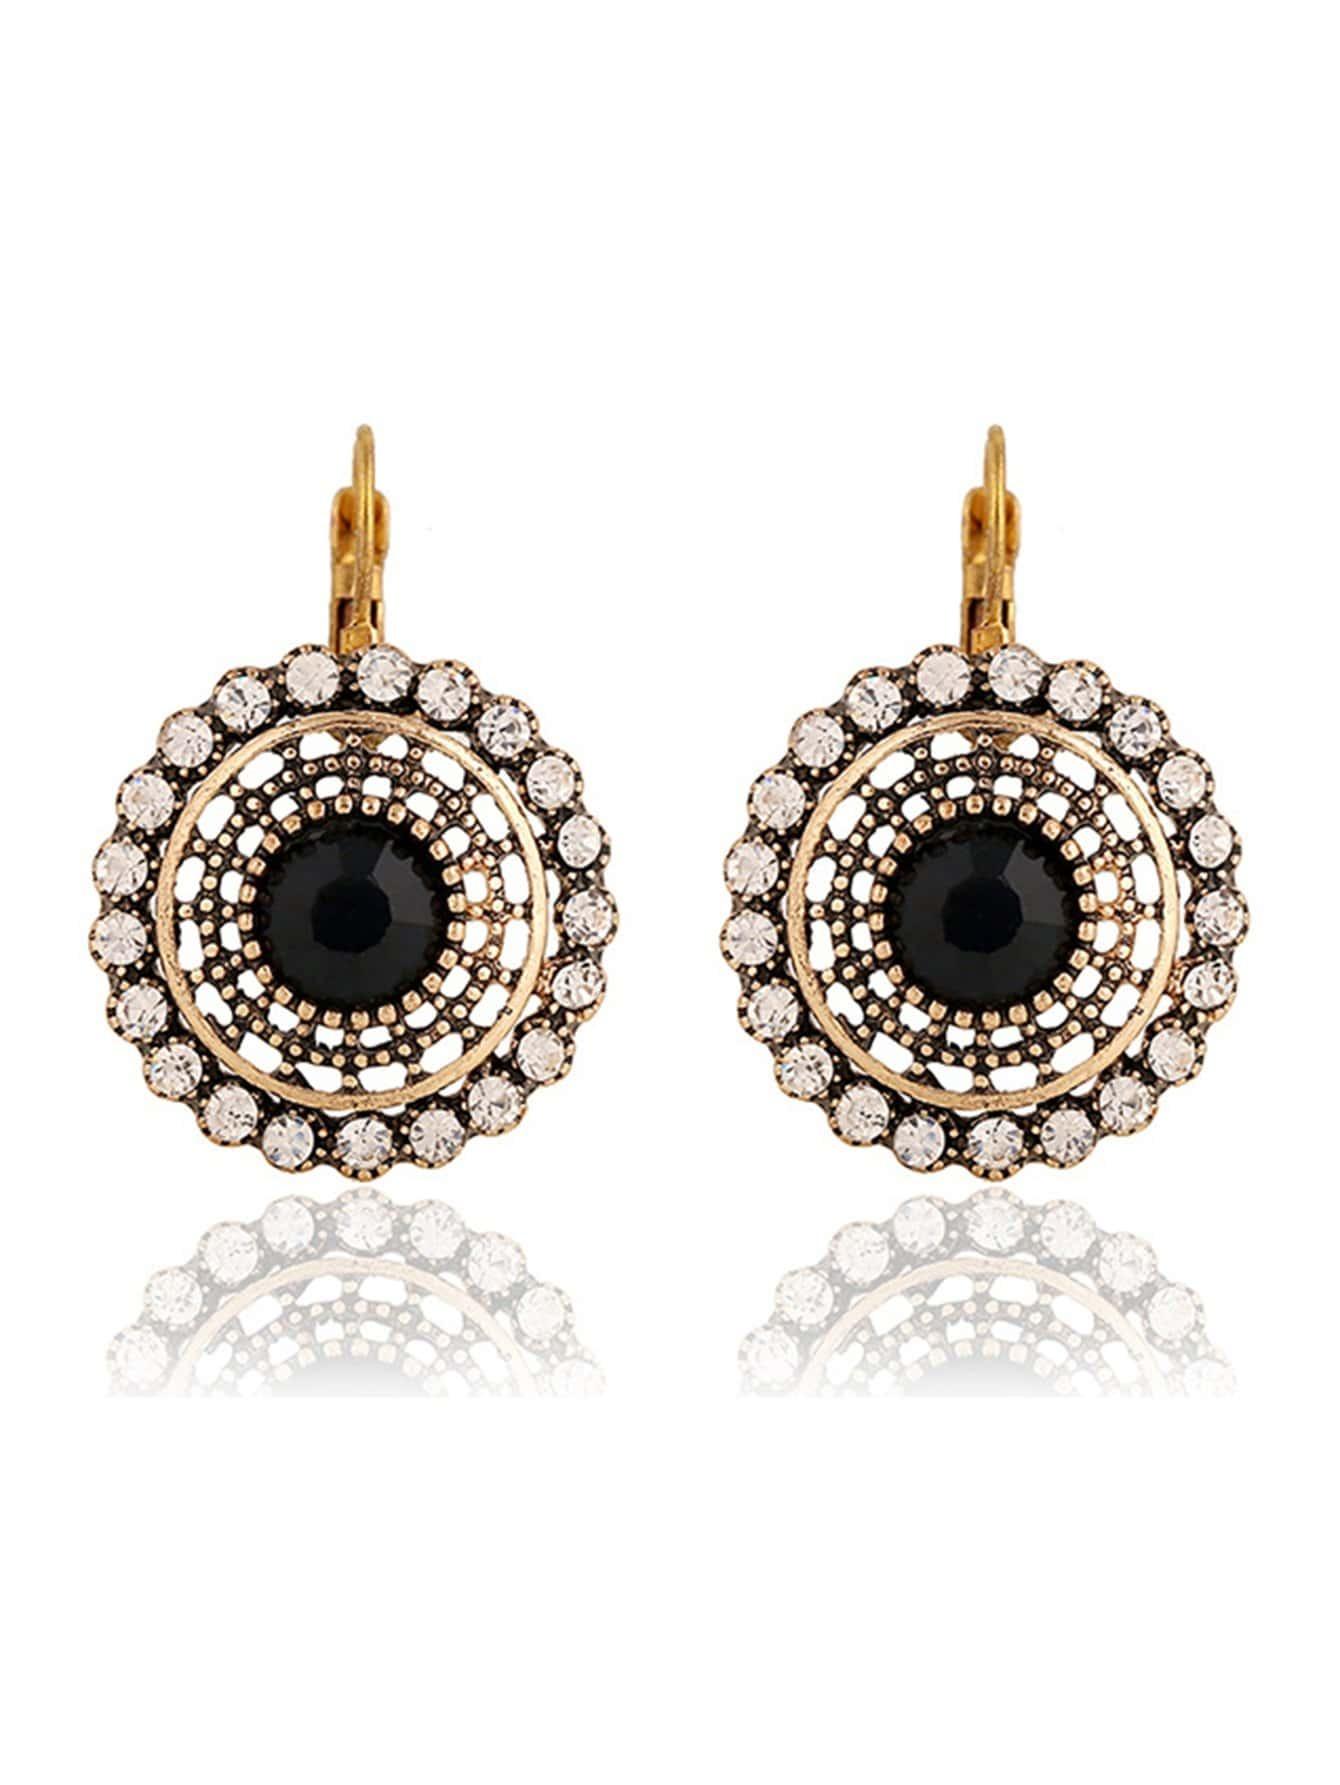 Rhinestone Clip On Earrings